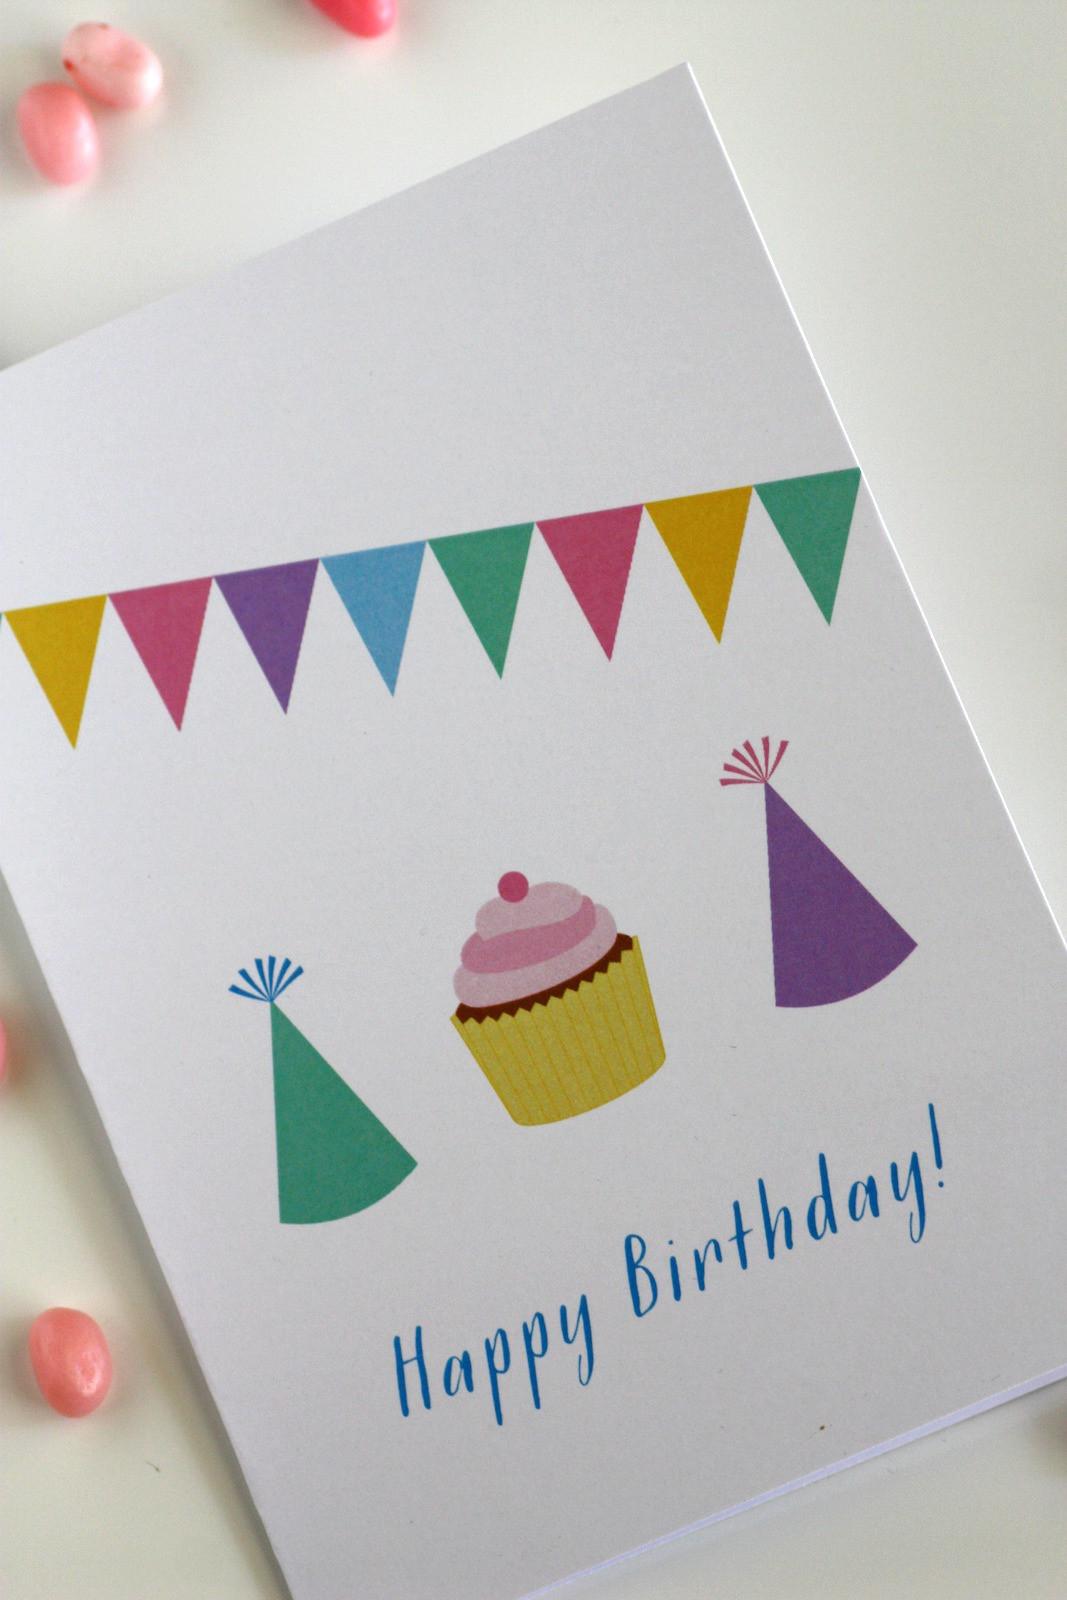 Free Printable Kids Birthday Cards  Download These Fun Free Printable Blank Birthday Cards Now